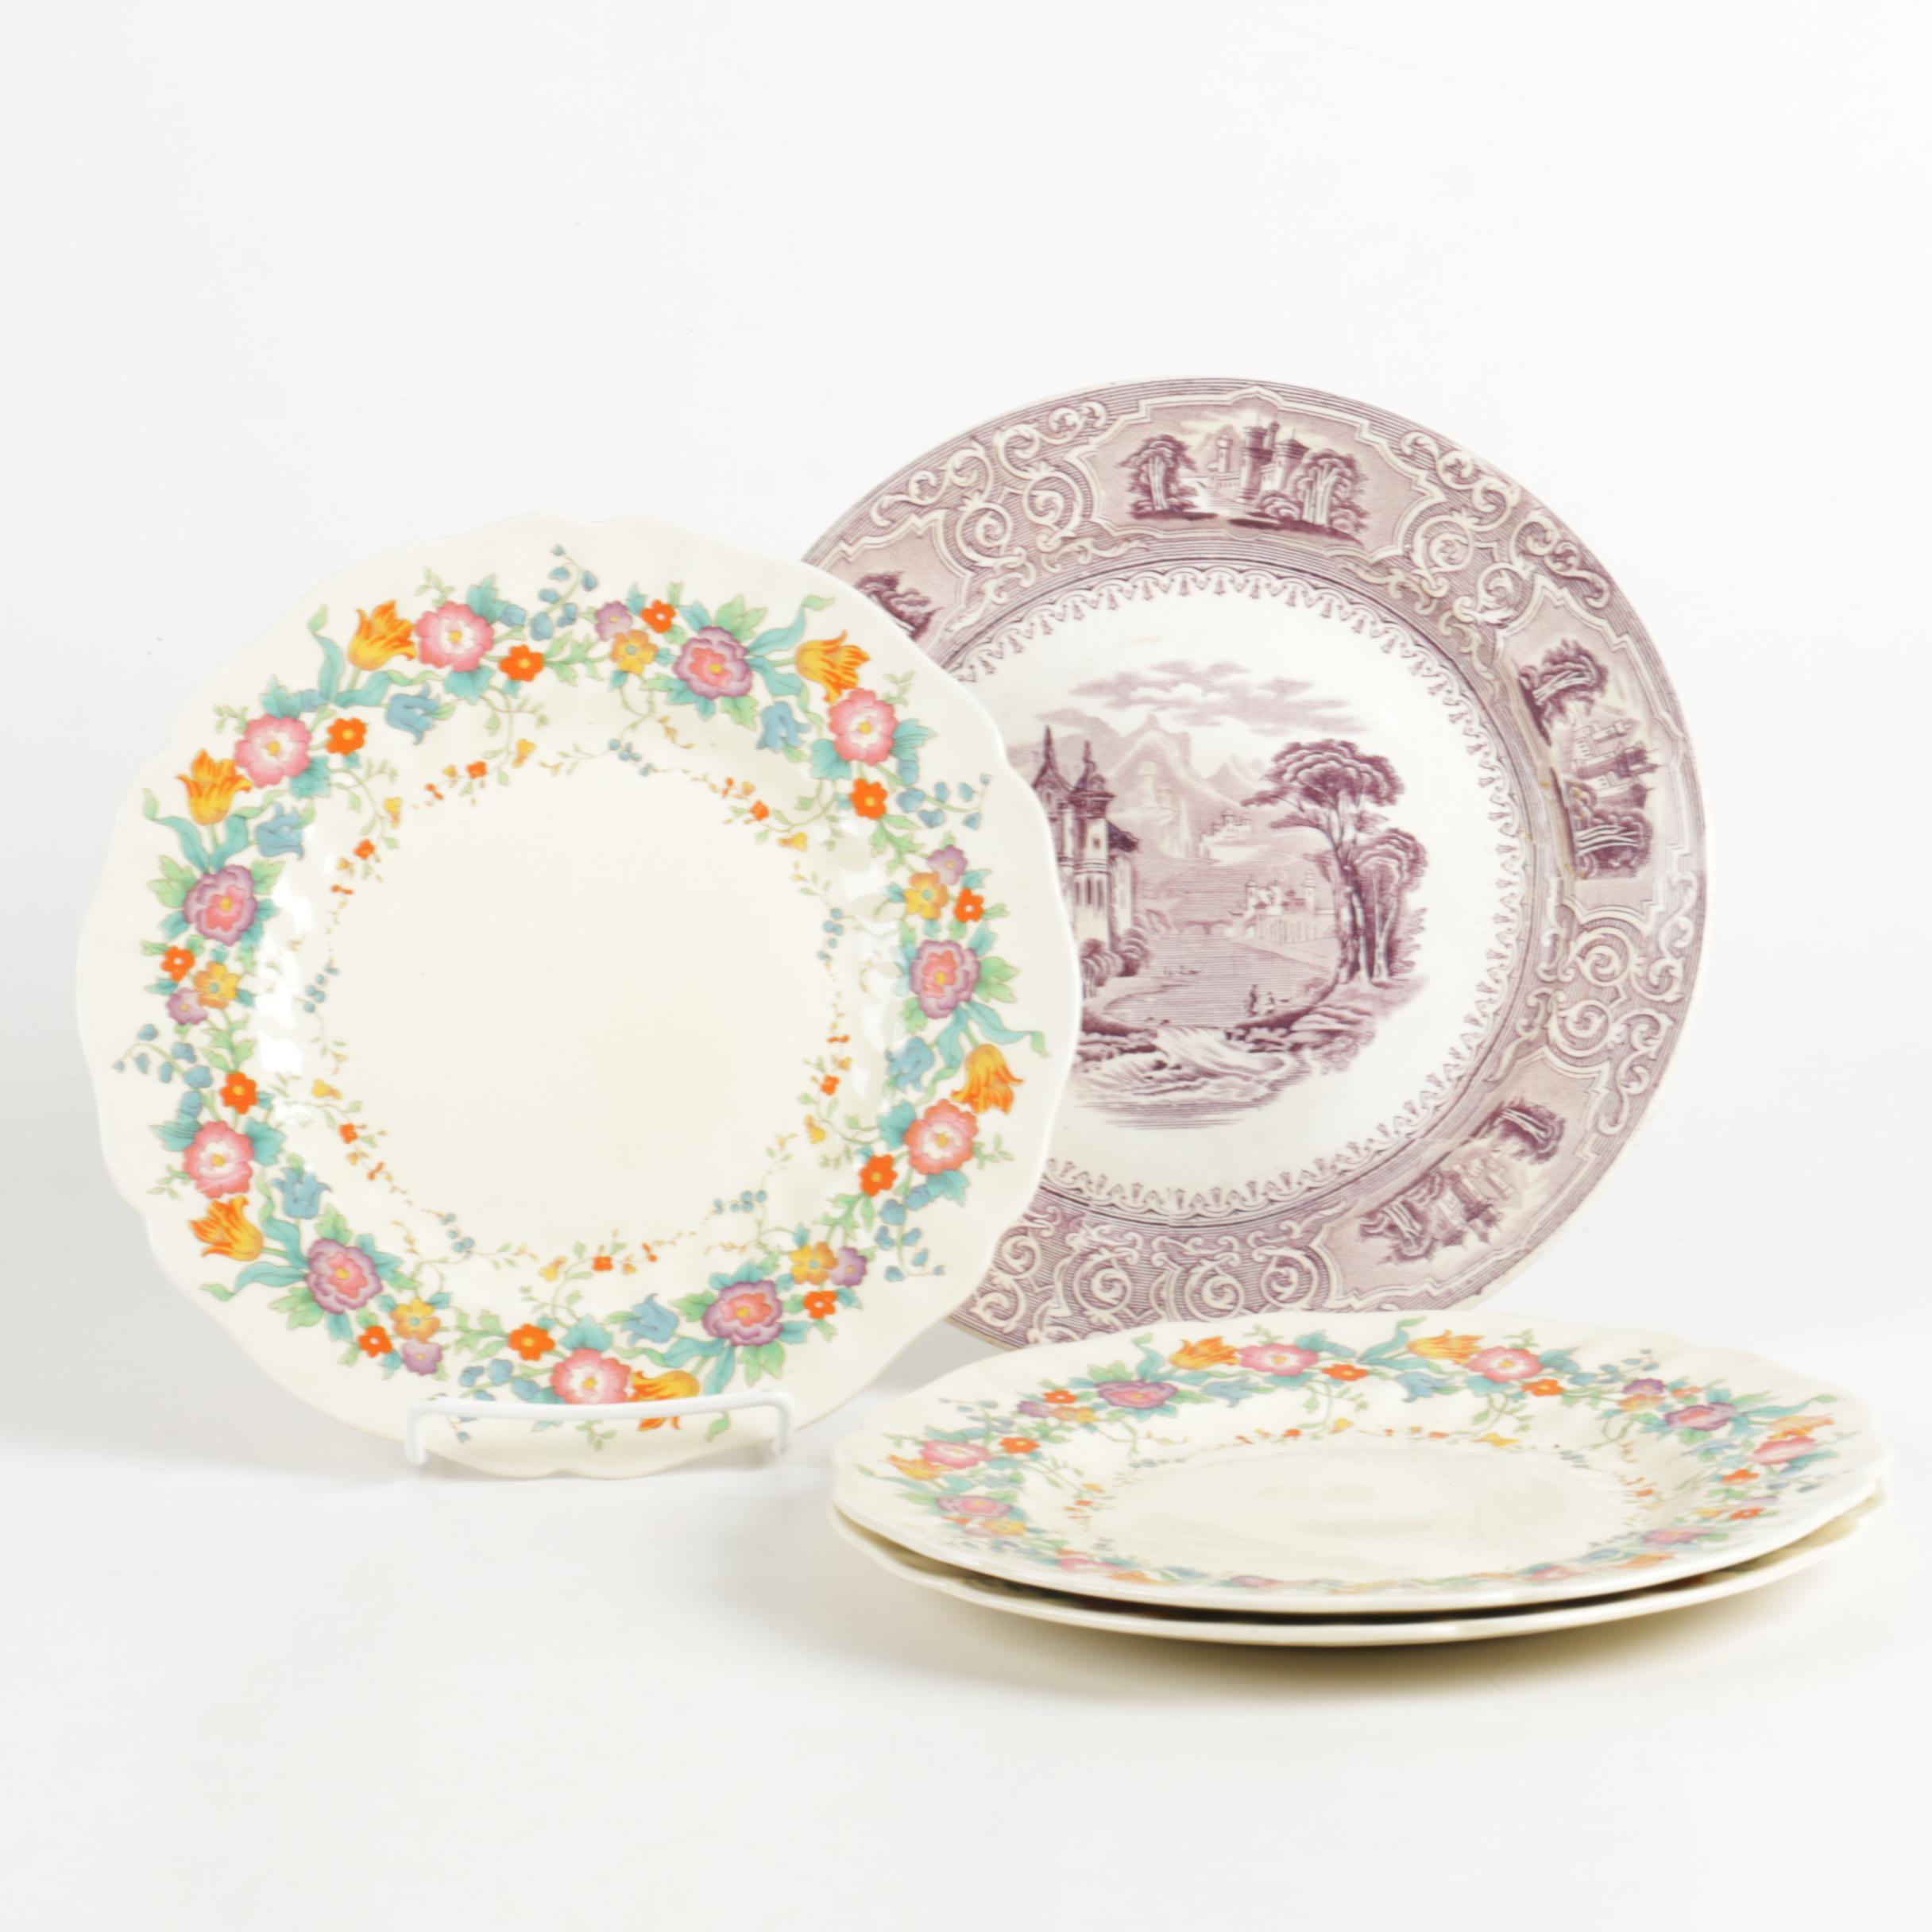 Royal Doulton \ The Portland\  with Antique English Plates ... & Royal Doulton \